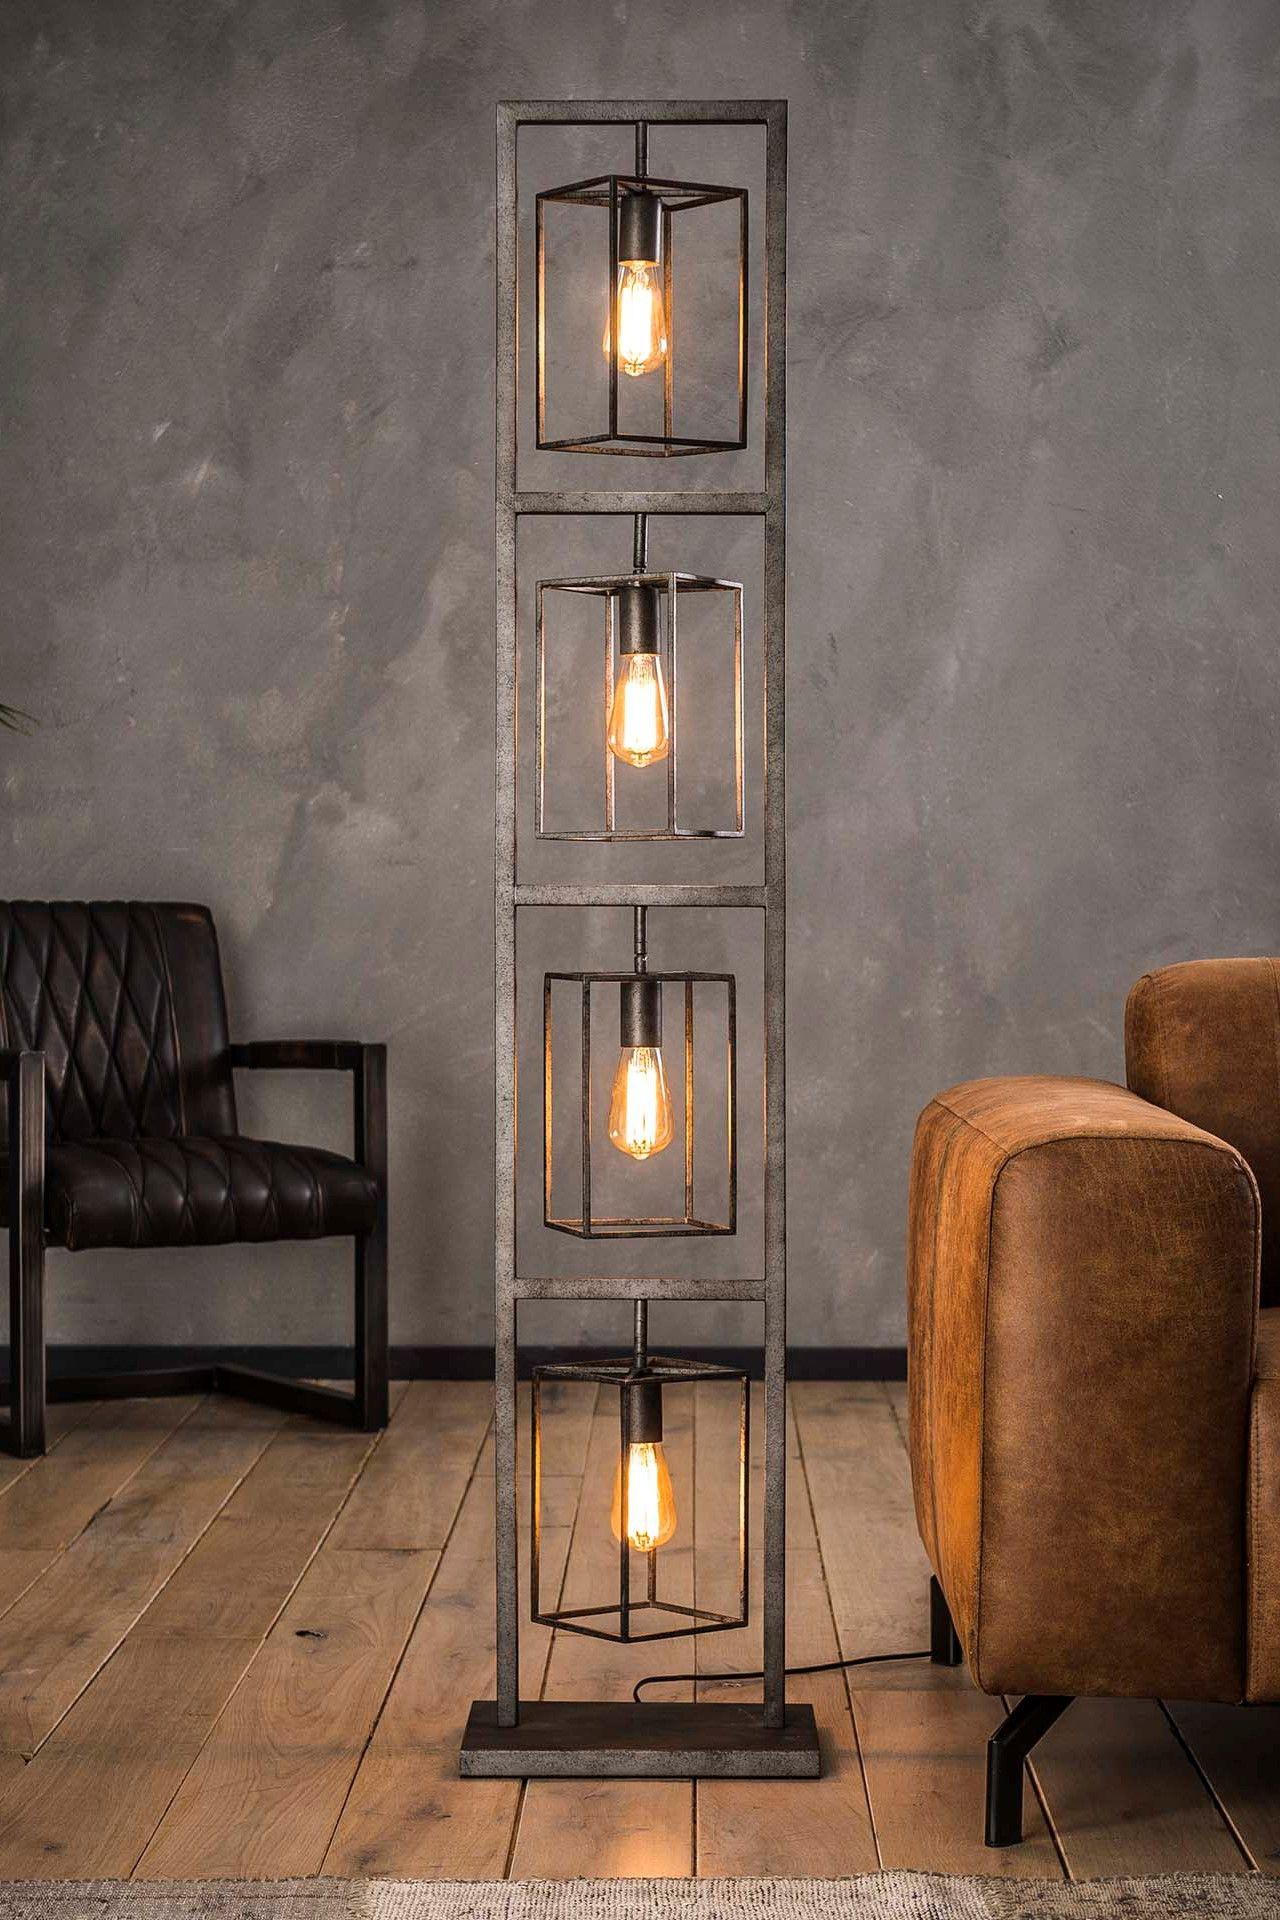 Originelle Stehlampe Stehlampe Lampen Lampe